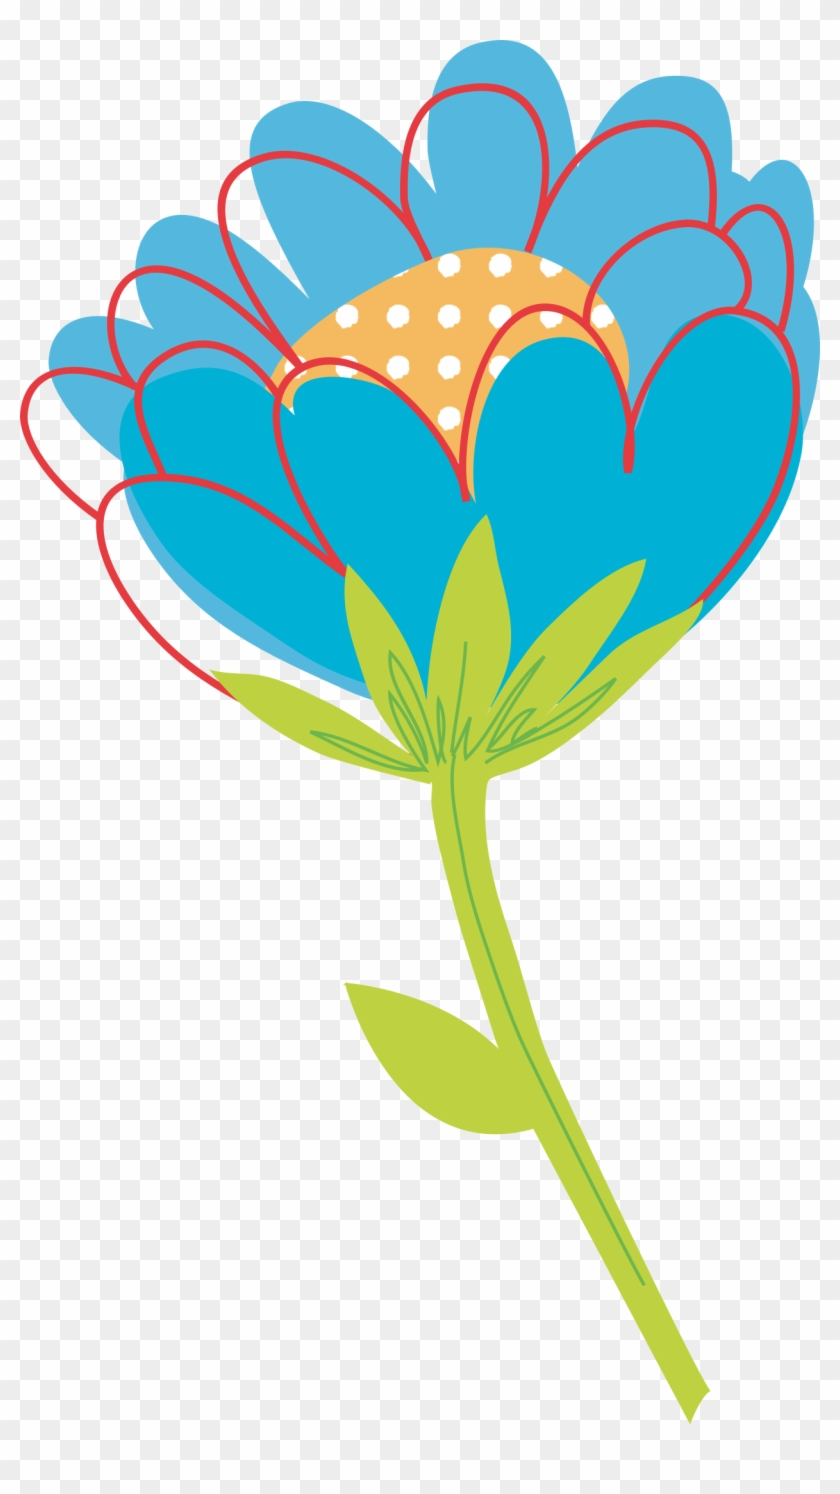 Blue Flower Clipart Big Flower - Flower Vector Png Png #97105